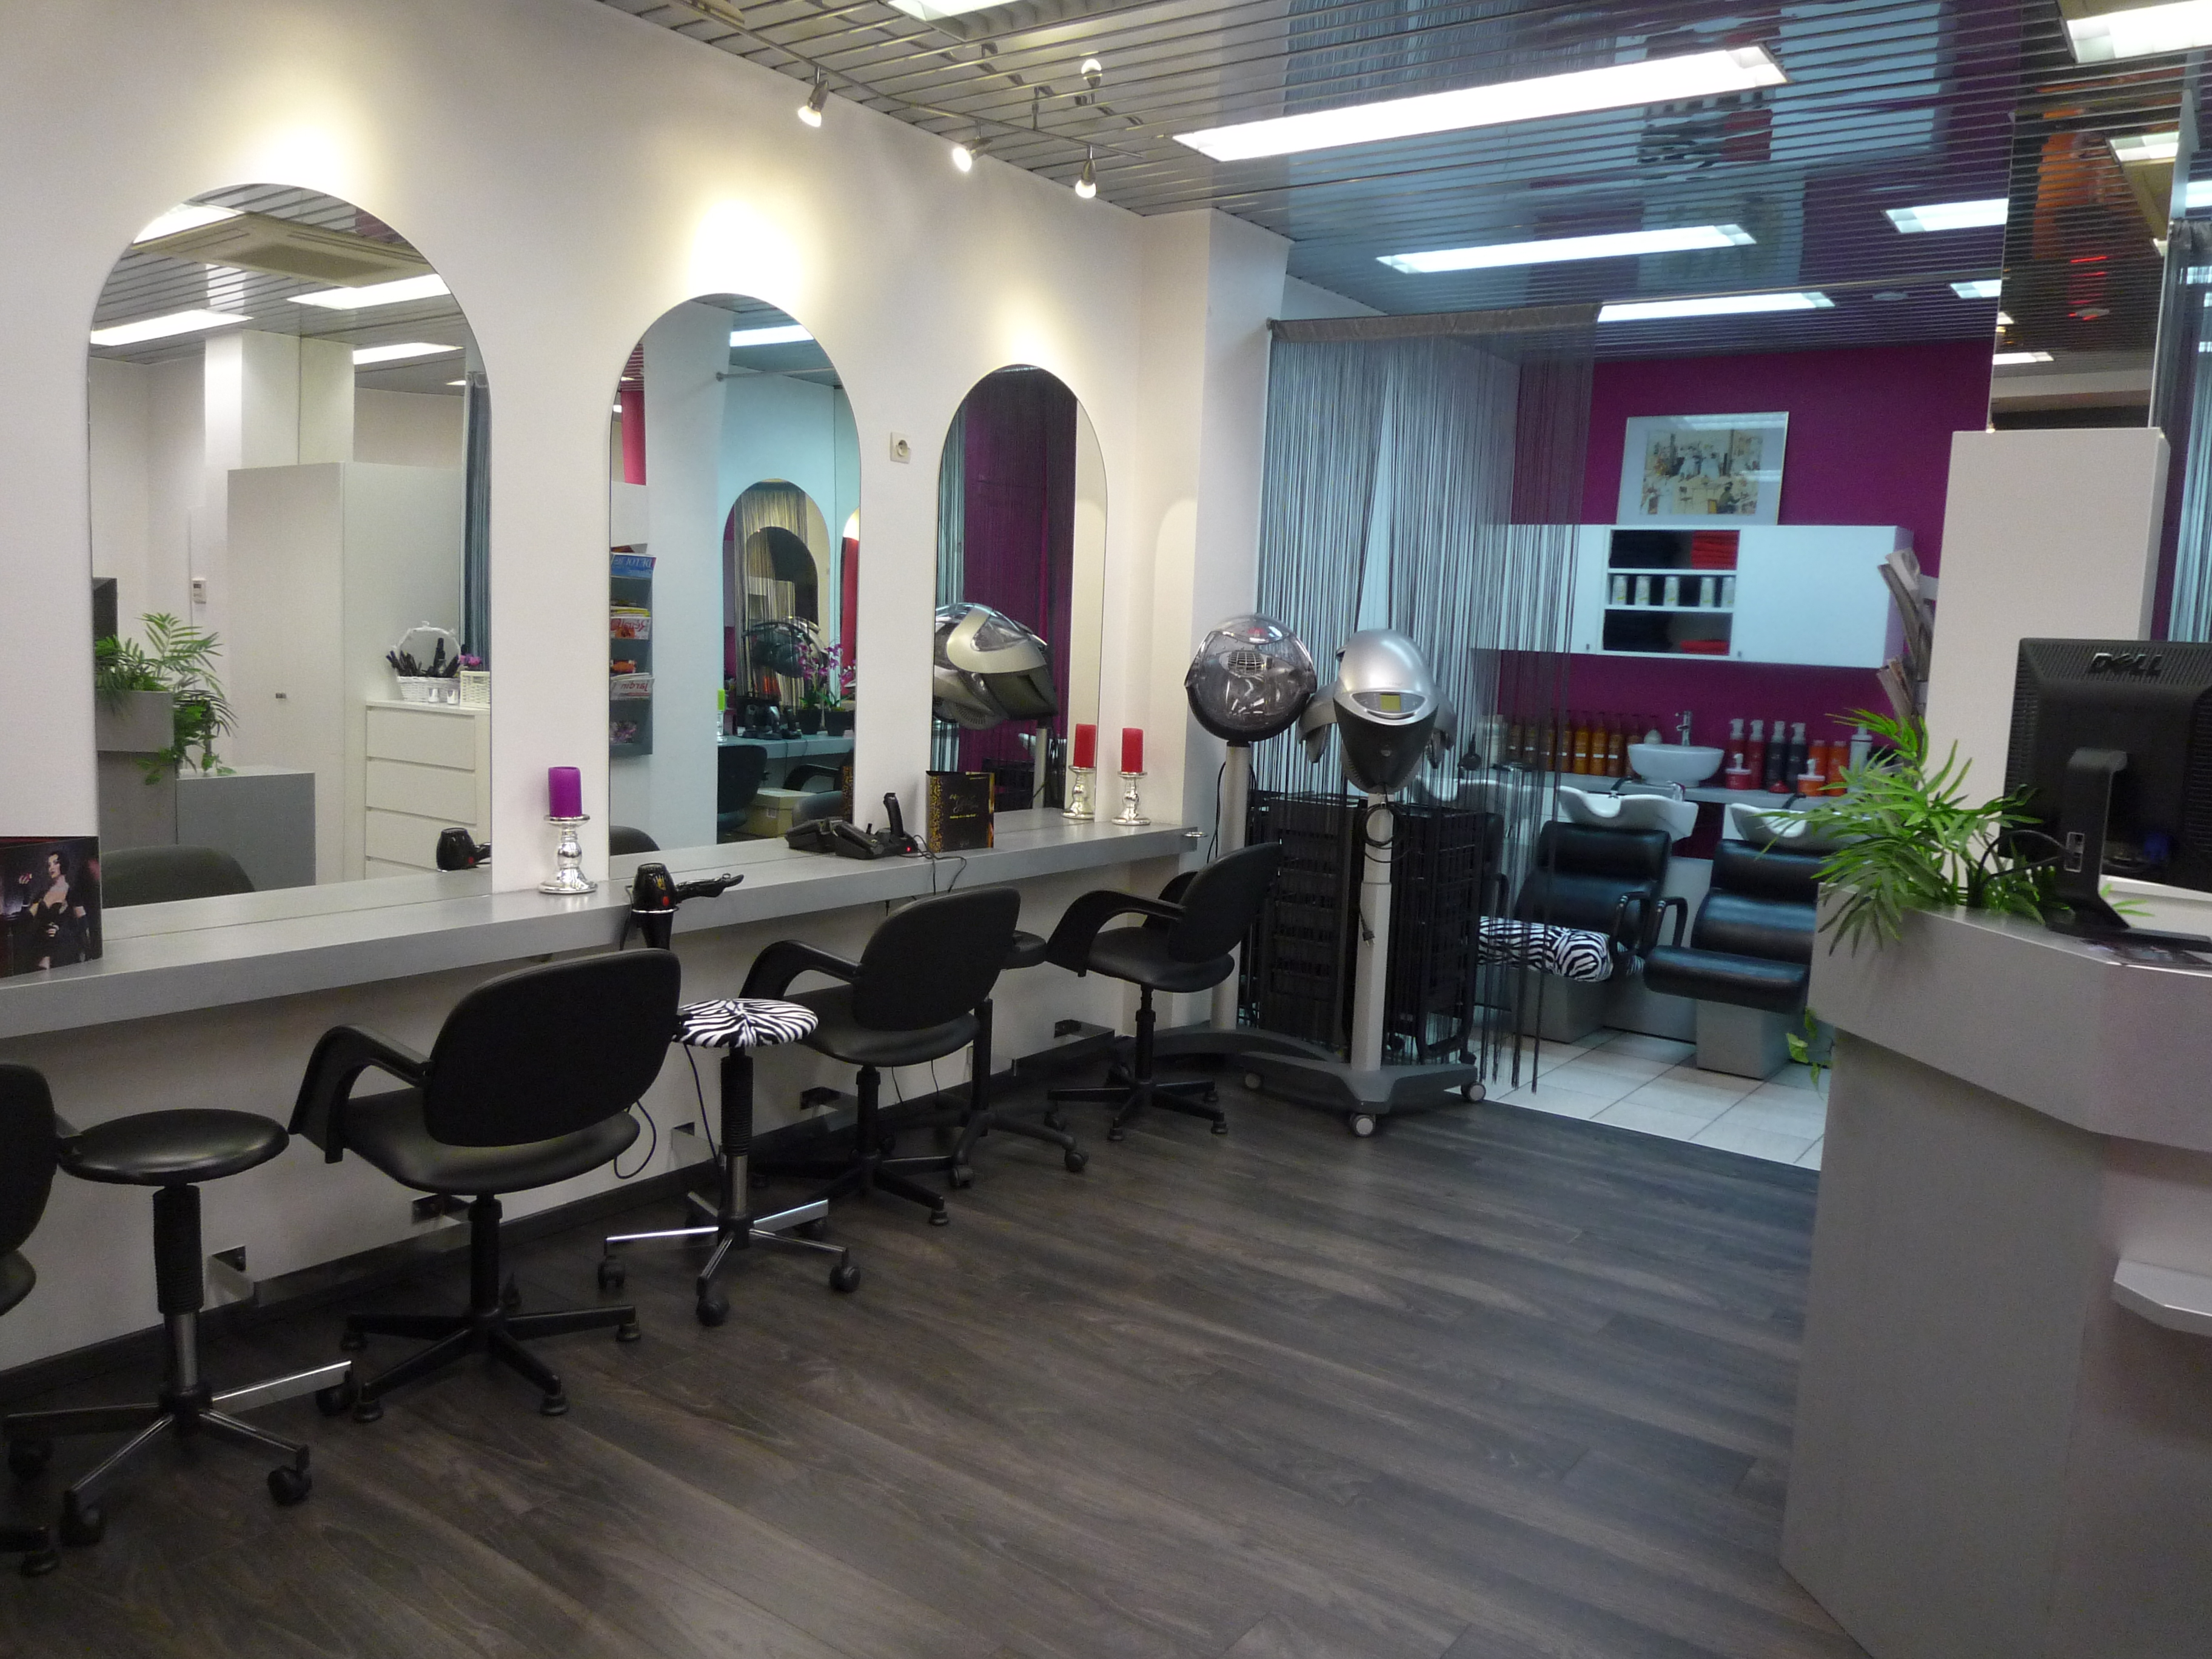 Salon de coiffure star international coiffure mode homme - Salon de coiffure vip ...